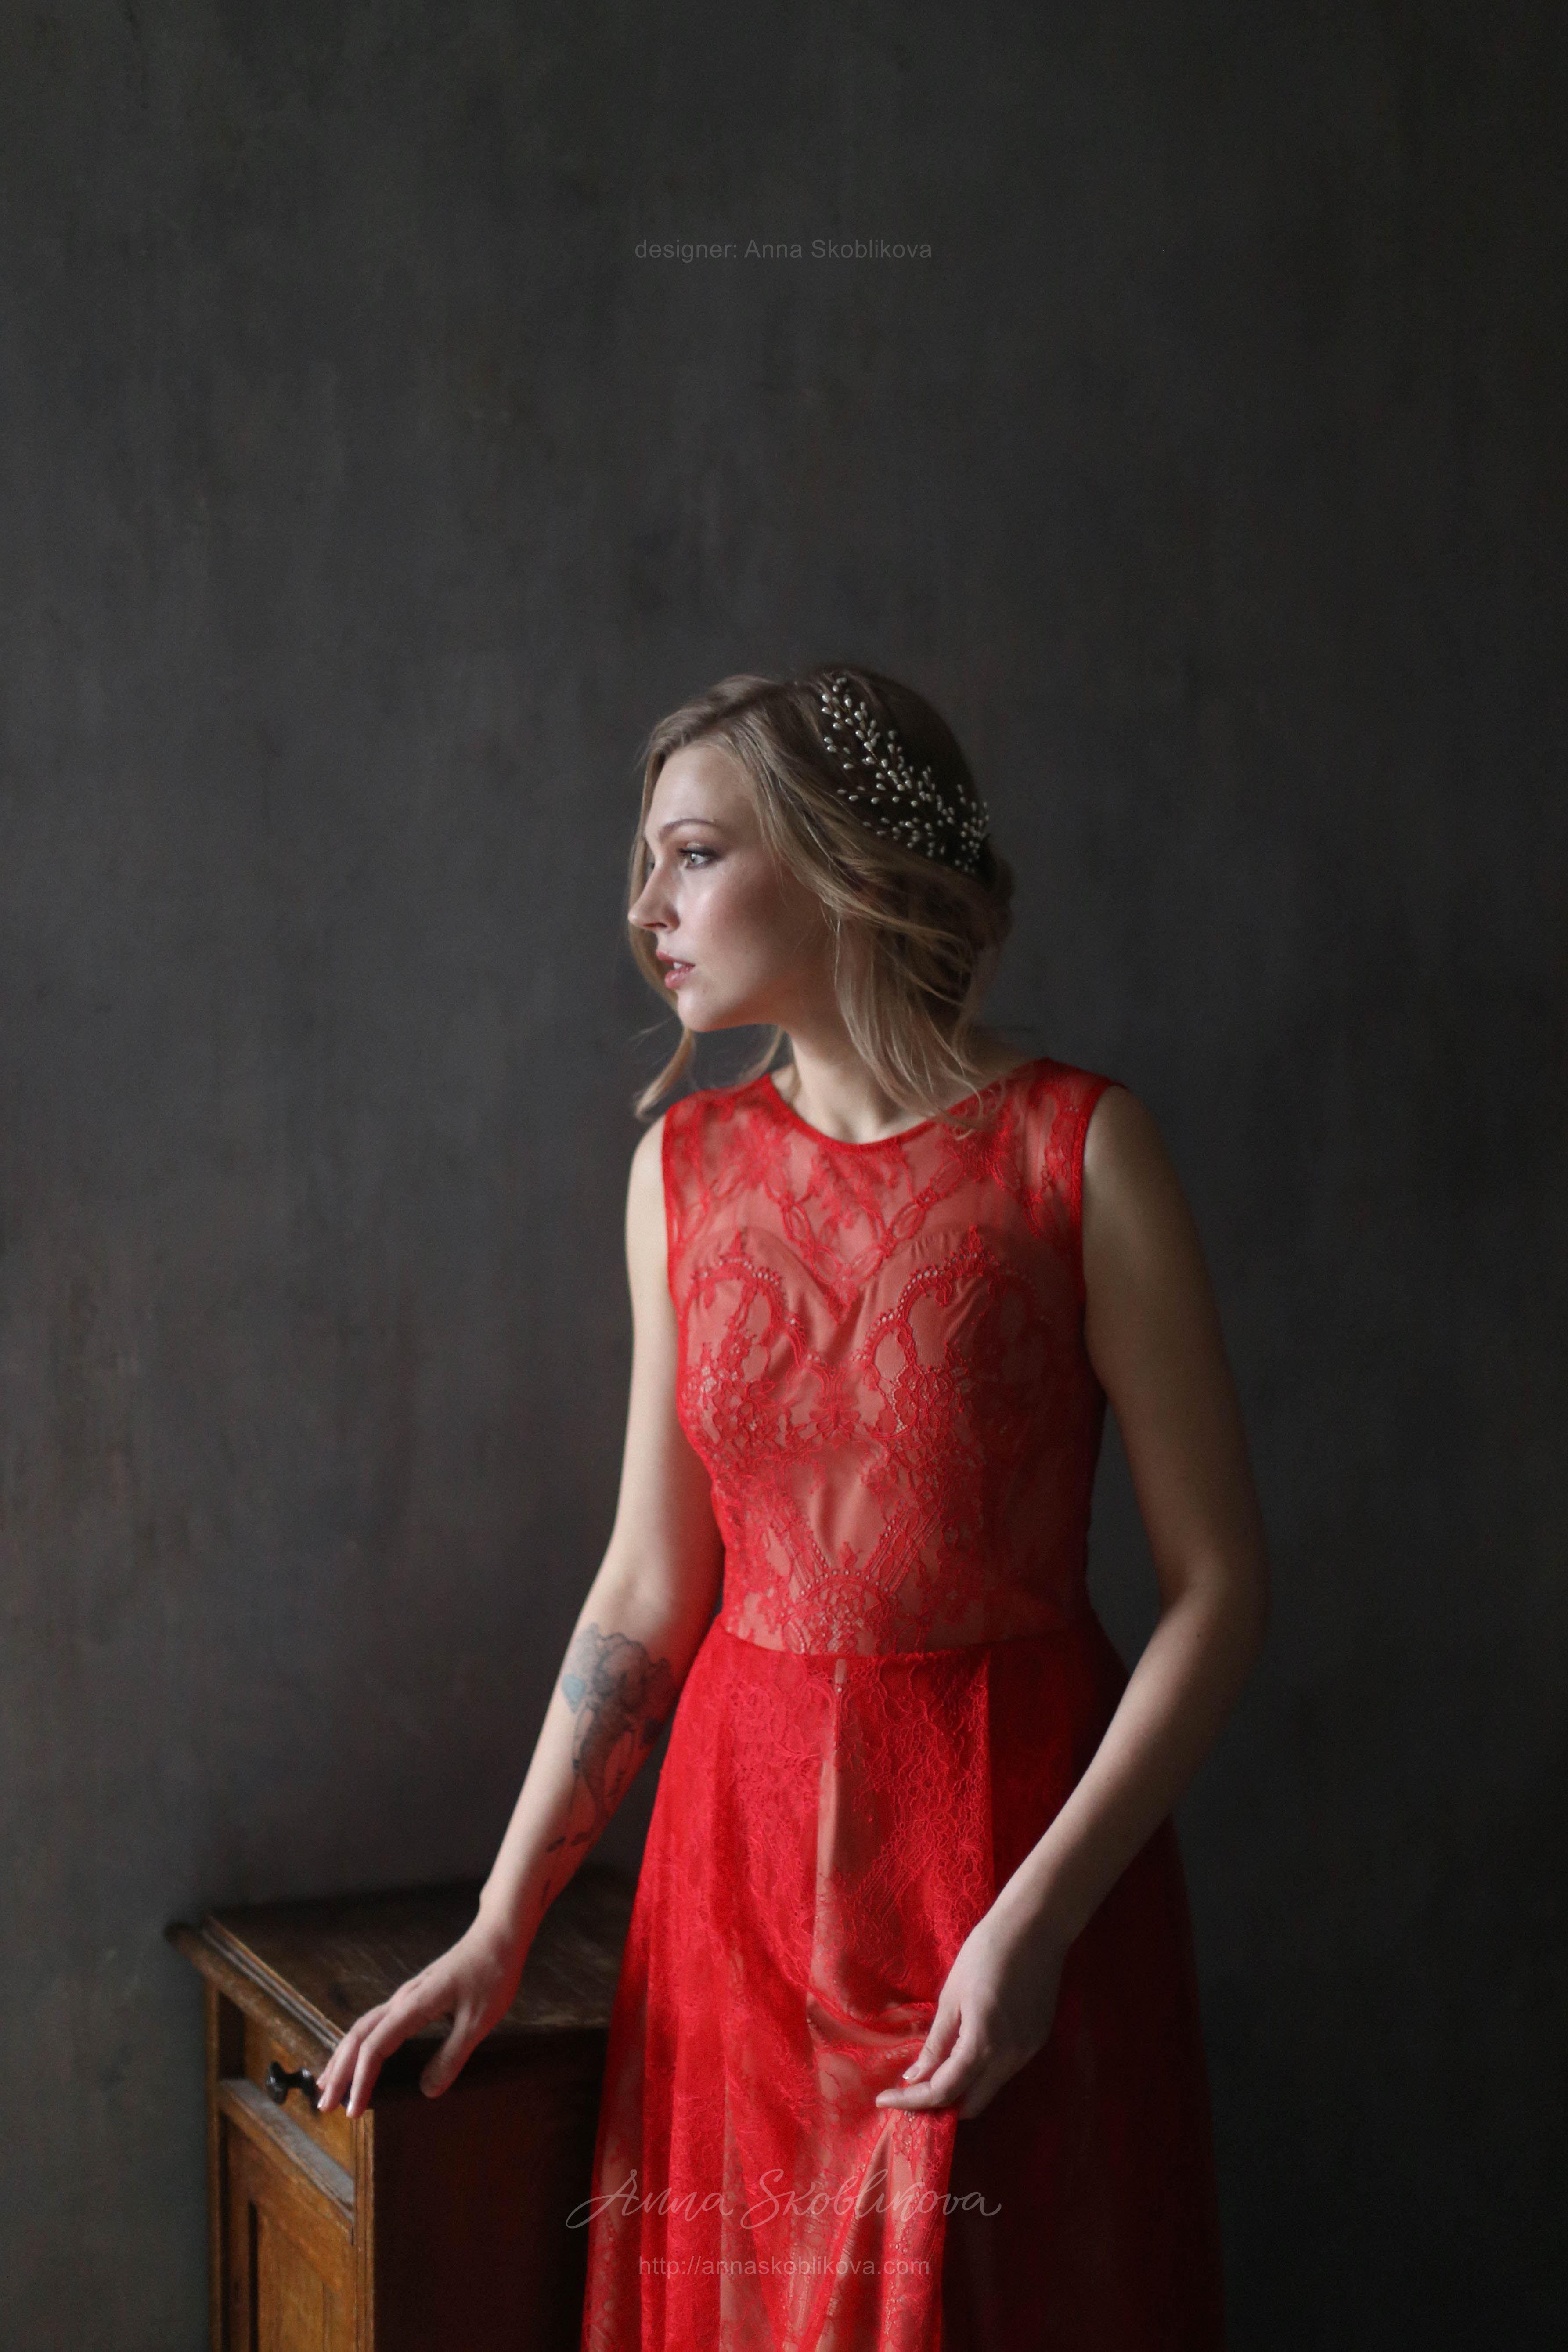 Red lace evening - Wedding dress | Anna Skoblikova - Wedding Dresses ...